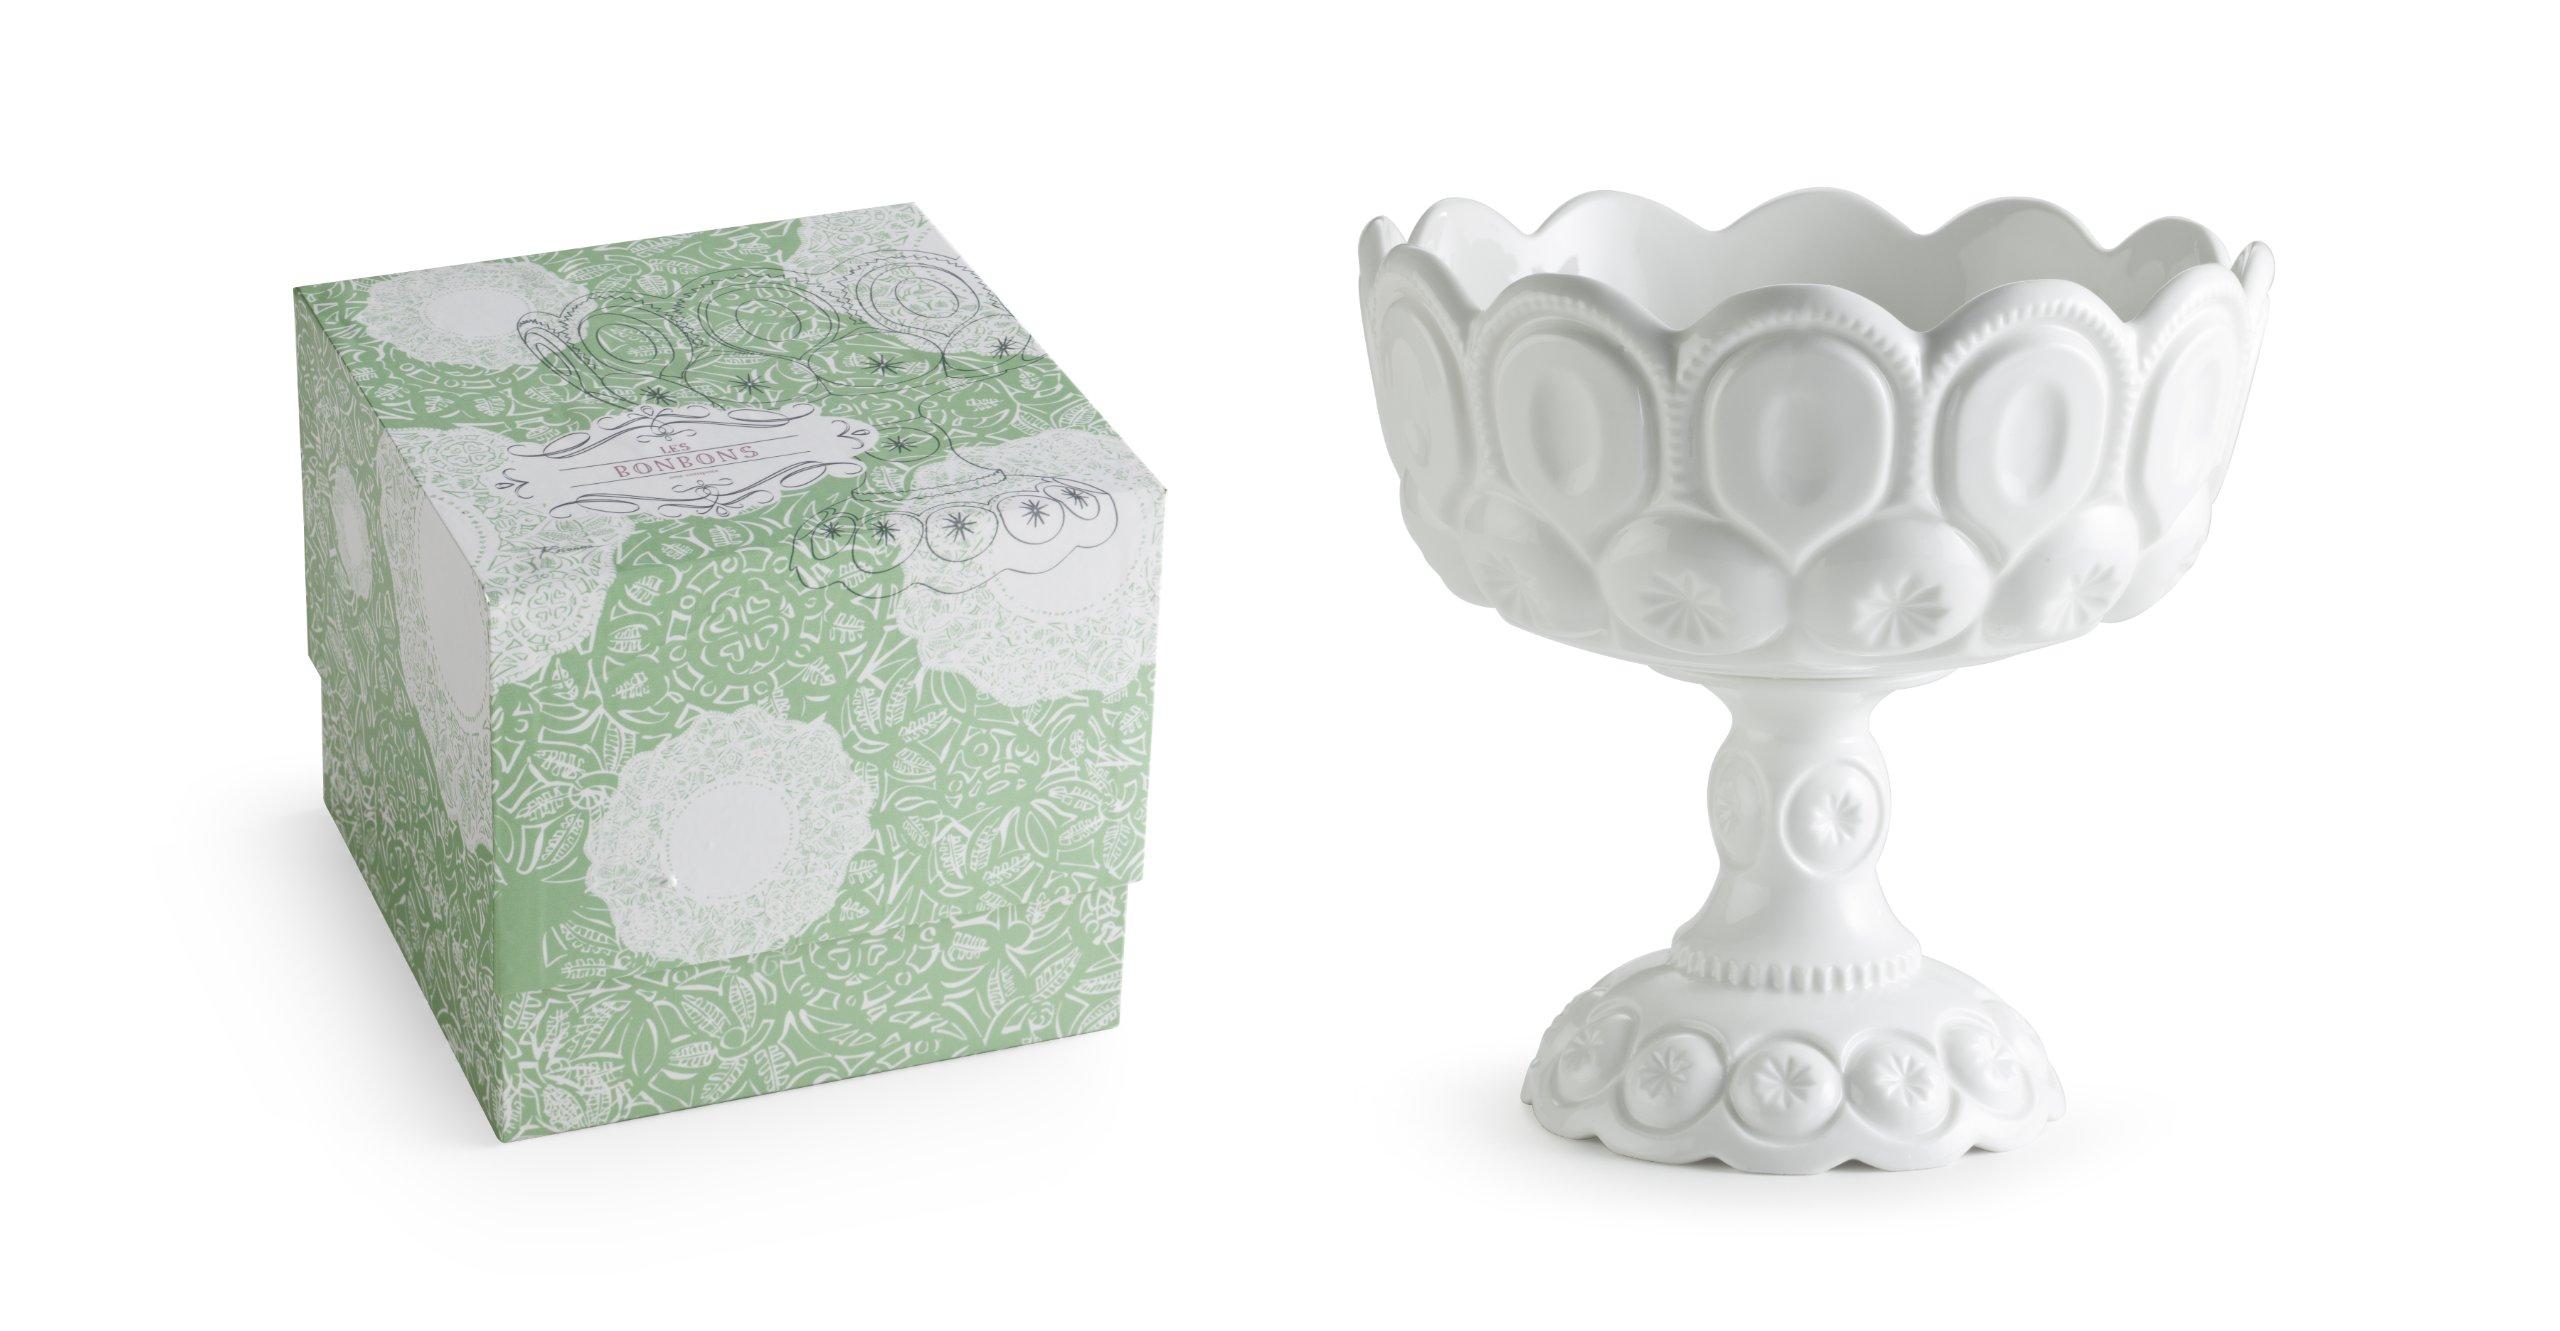 Rosanna Les Bon Bons Large Footed Bowls Compote Pedestal